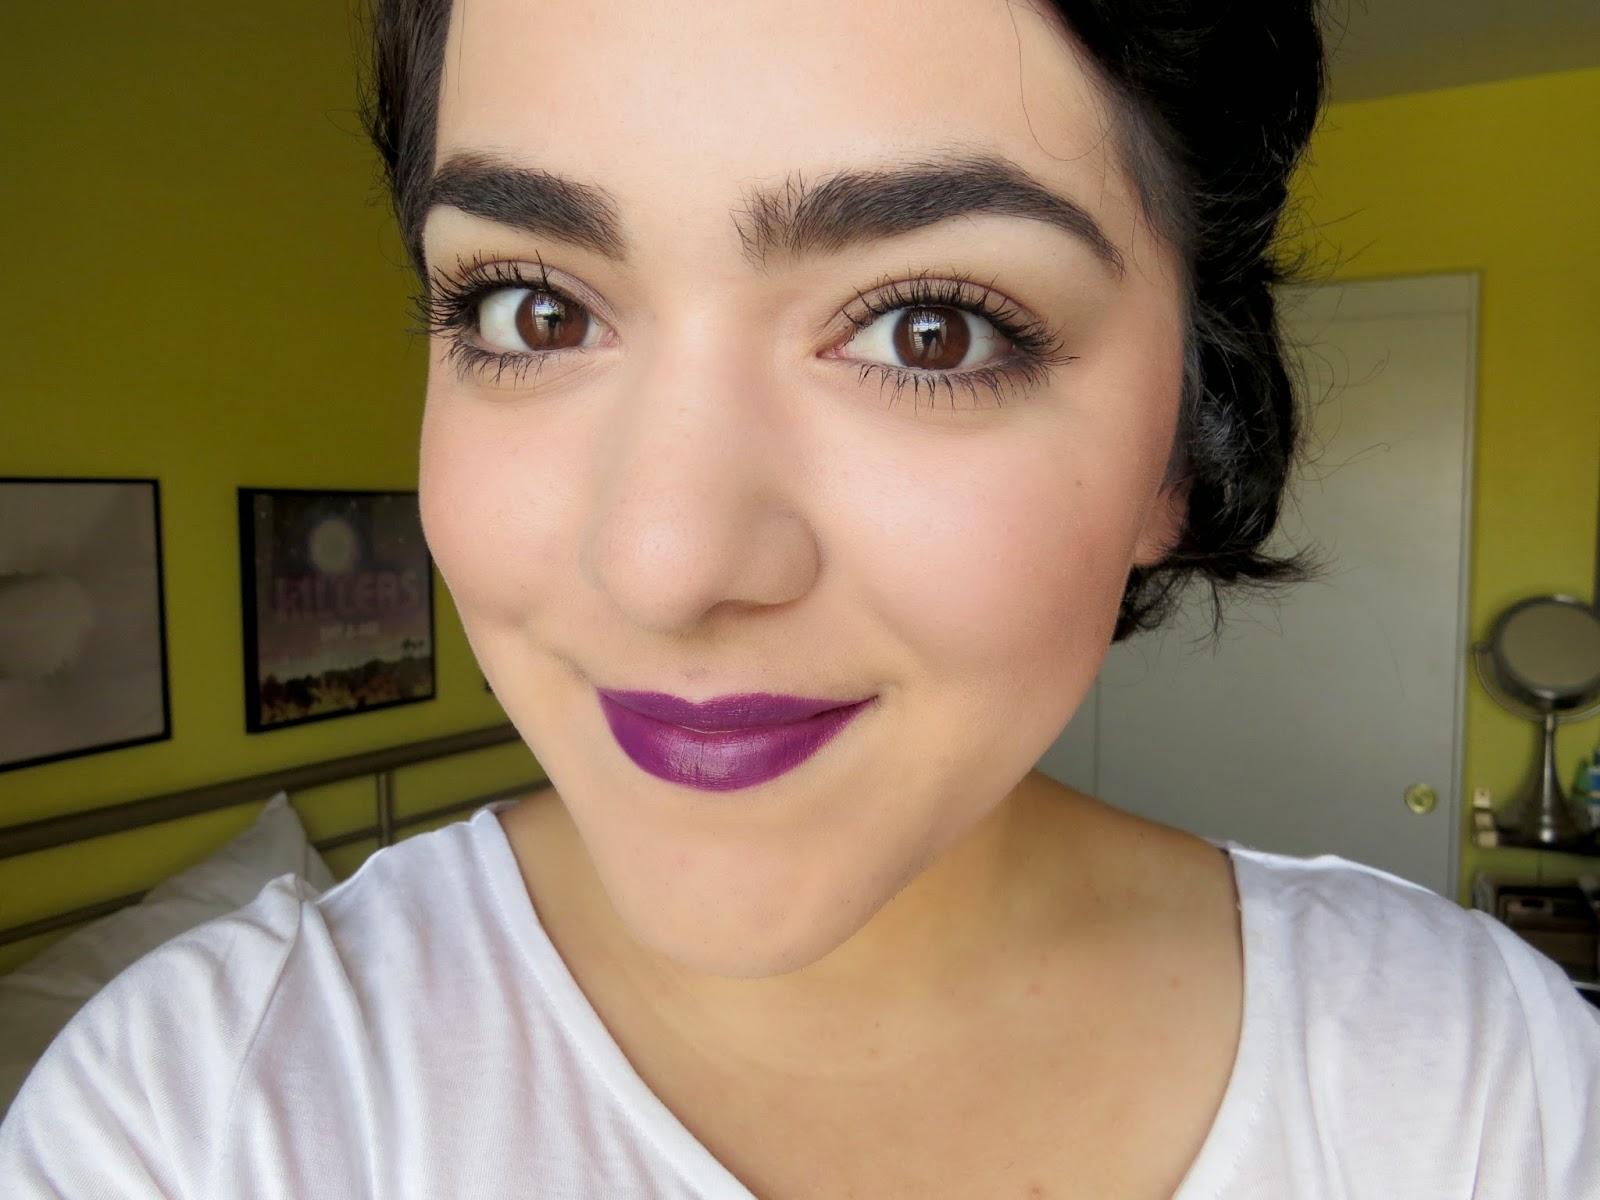 Lorde Lipstick